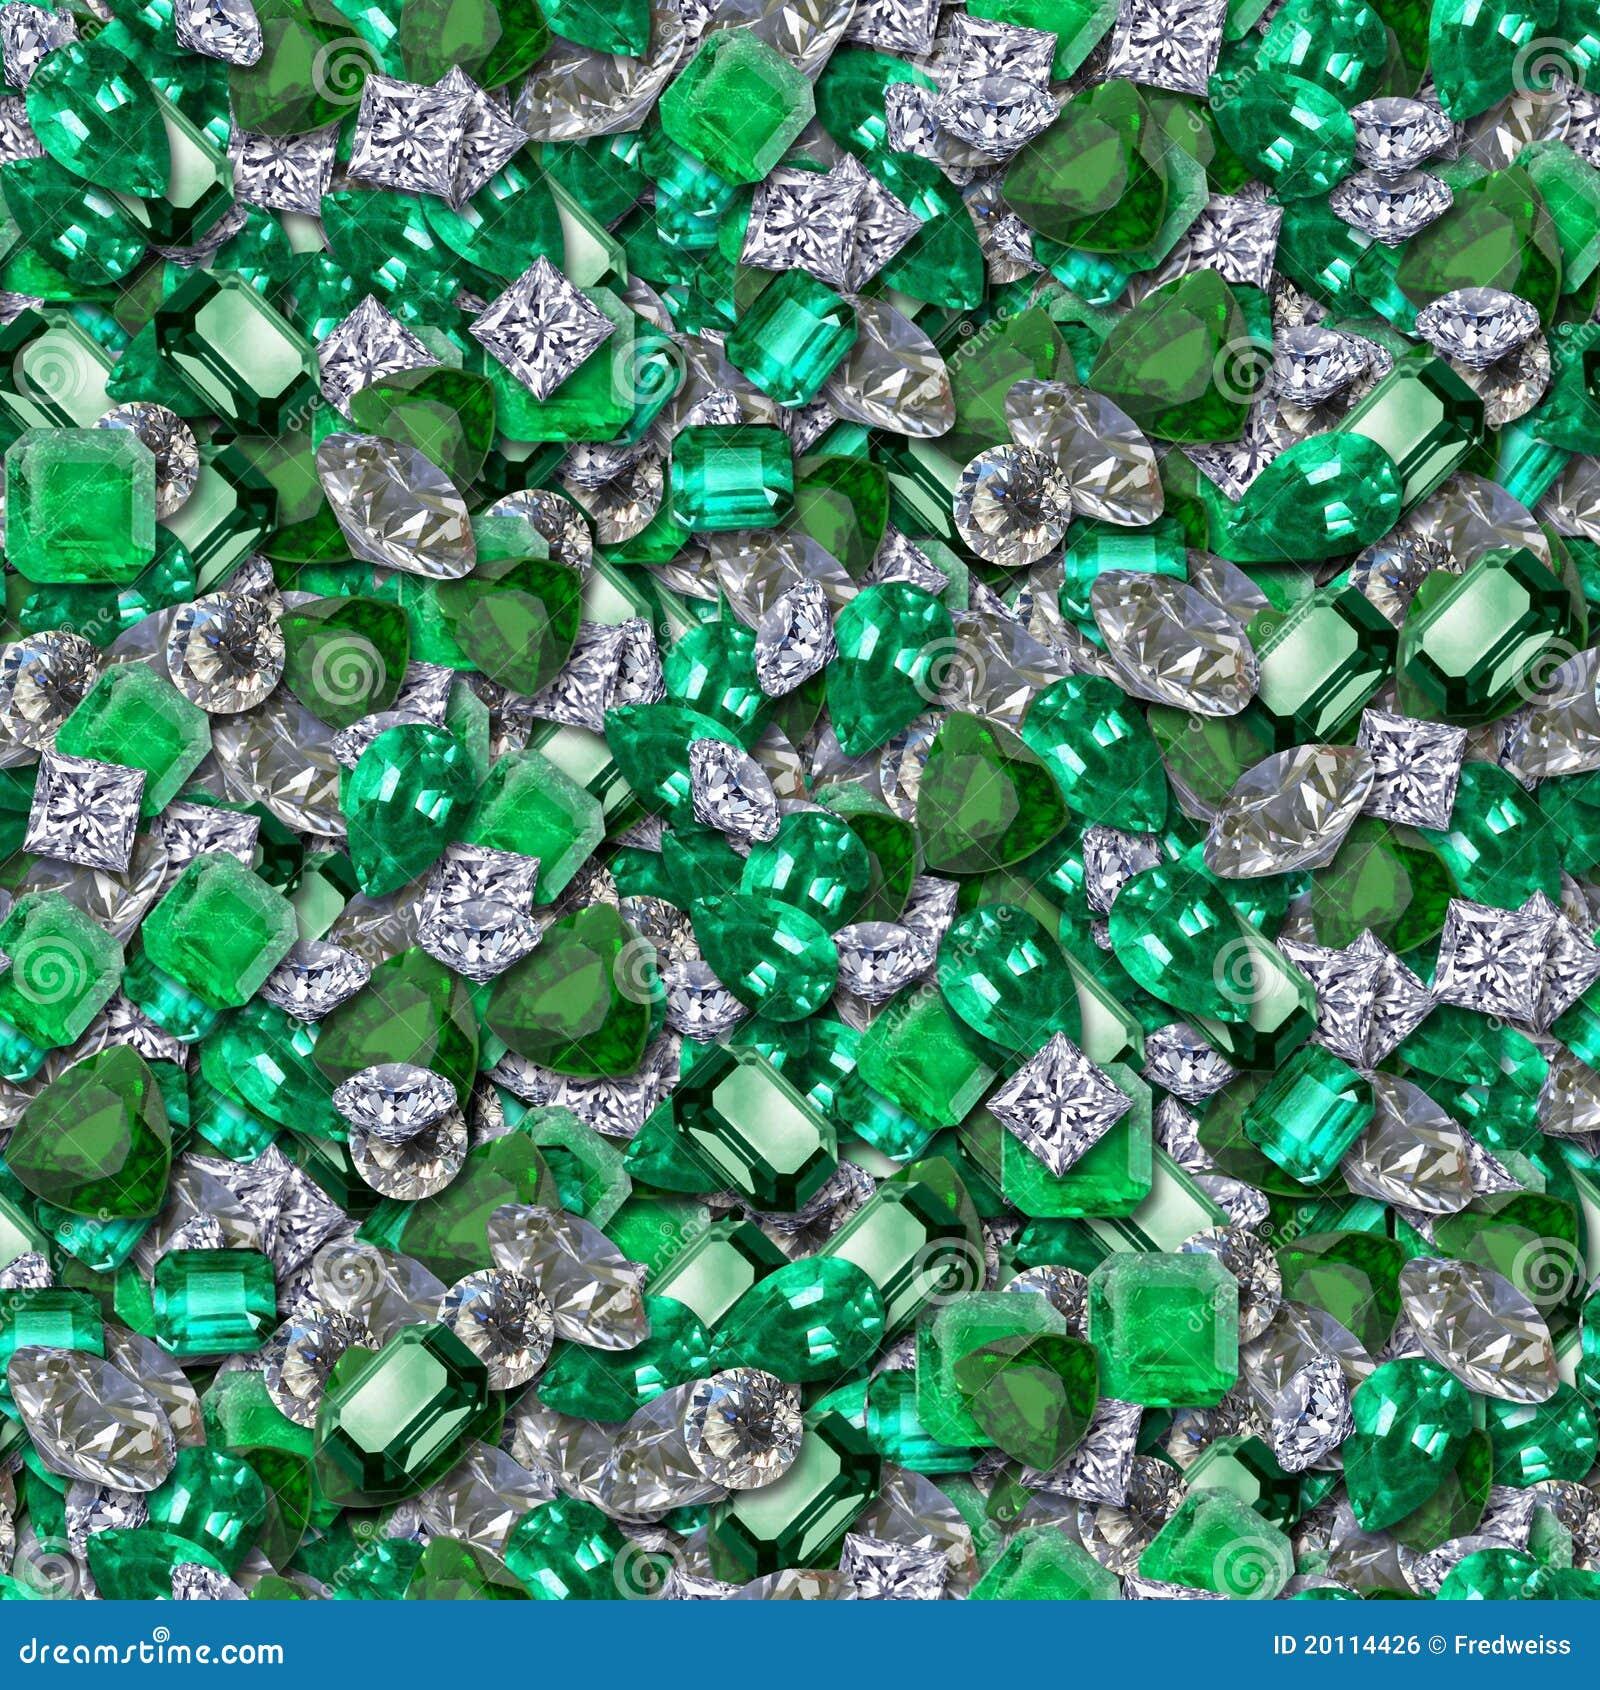 Diamonds And Emeralds Royalty Free Stock Image - Image: 20114426